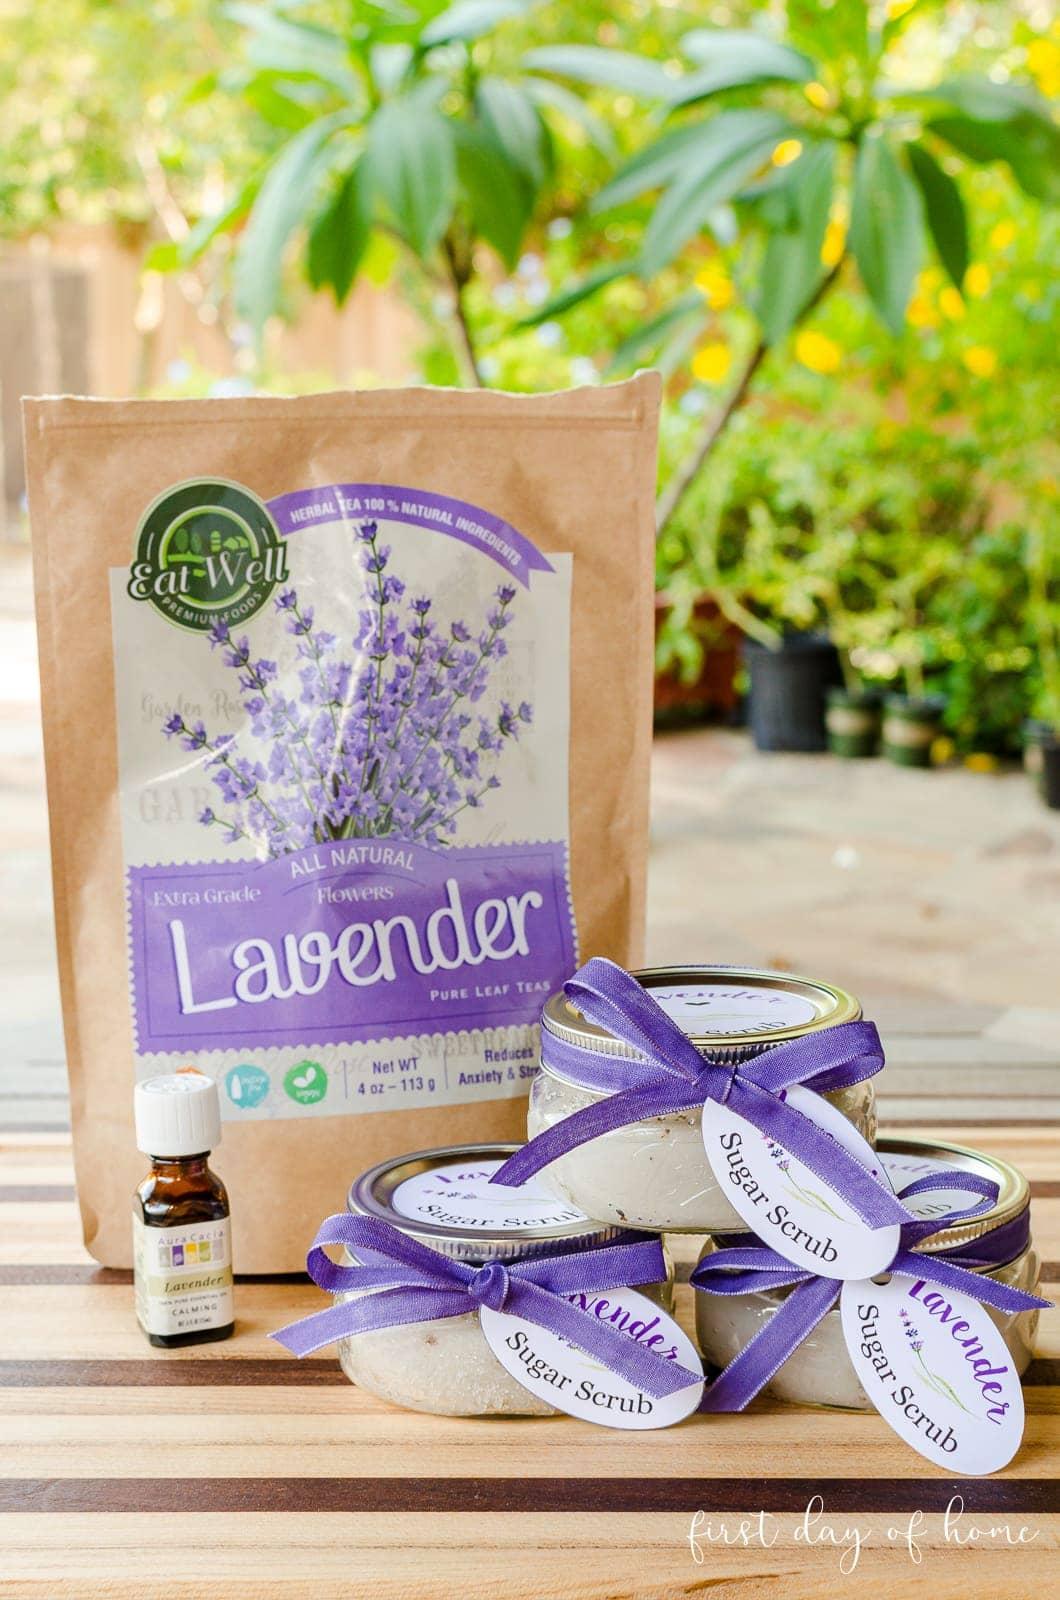 DIY lavender sugar scrub recipe supplies-lavender buds, lavender essential oil and mason jars with decorative printable tags